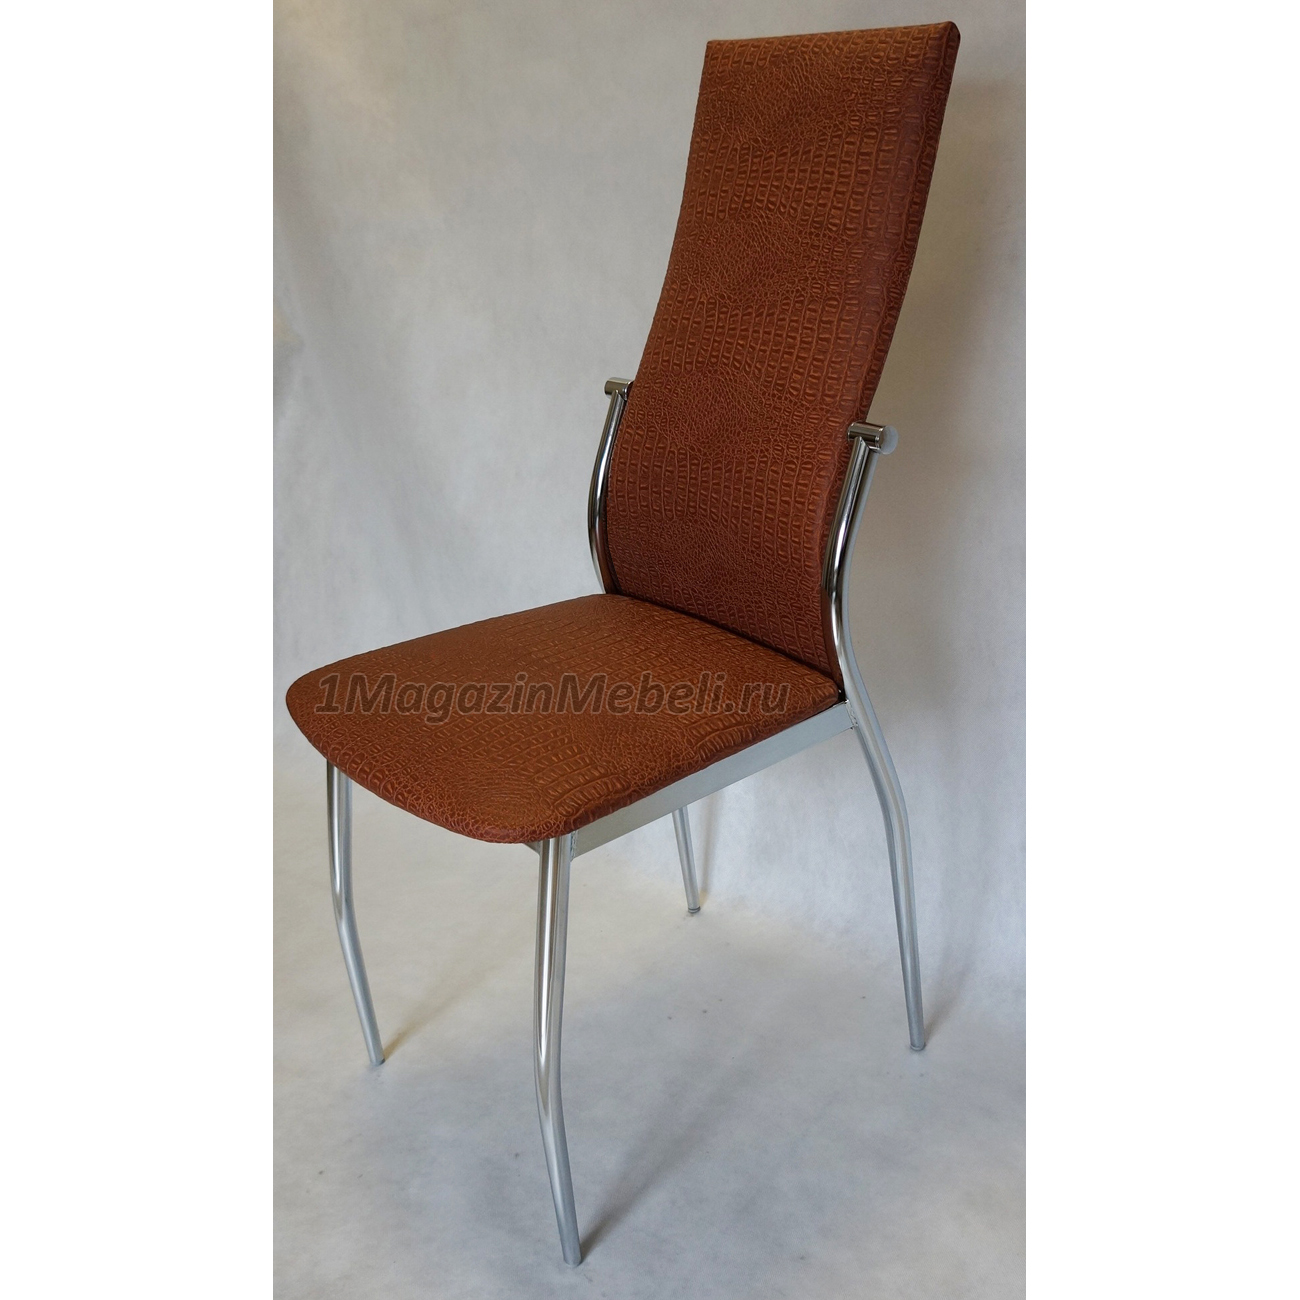 Кухонный стул коричневый крокодил, терракот, хром (арт. М3220)